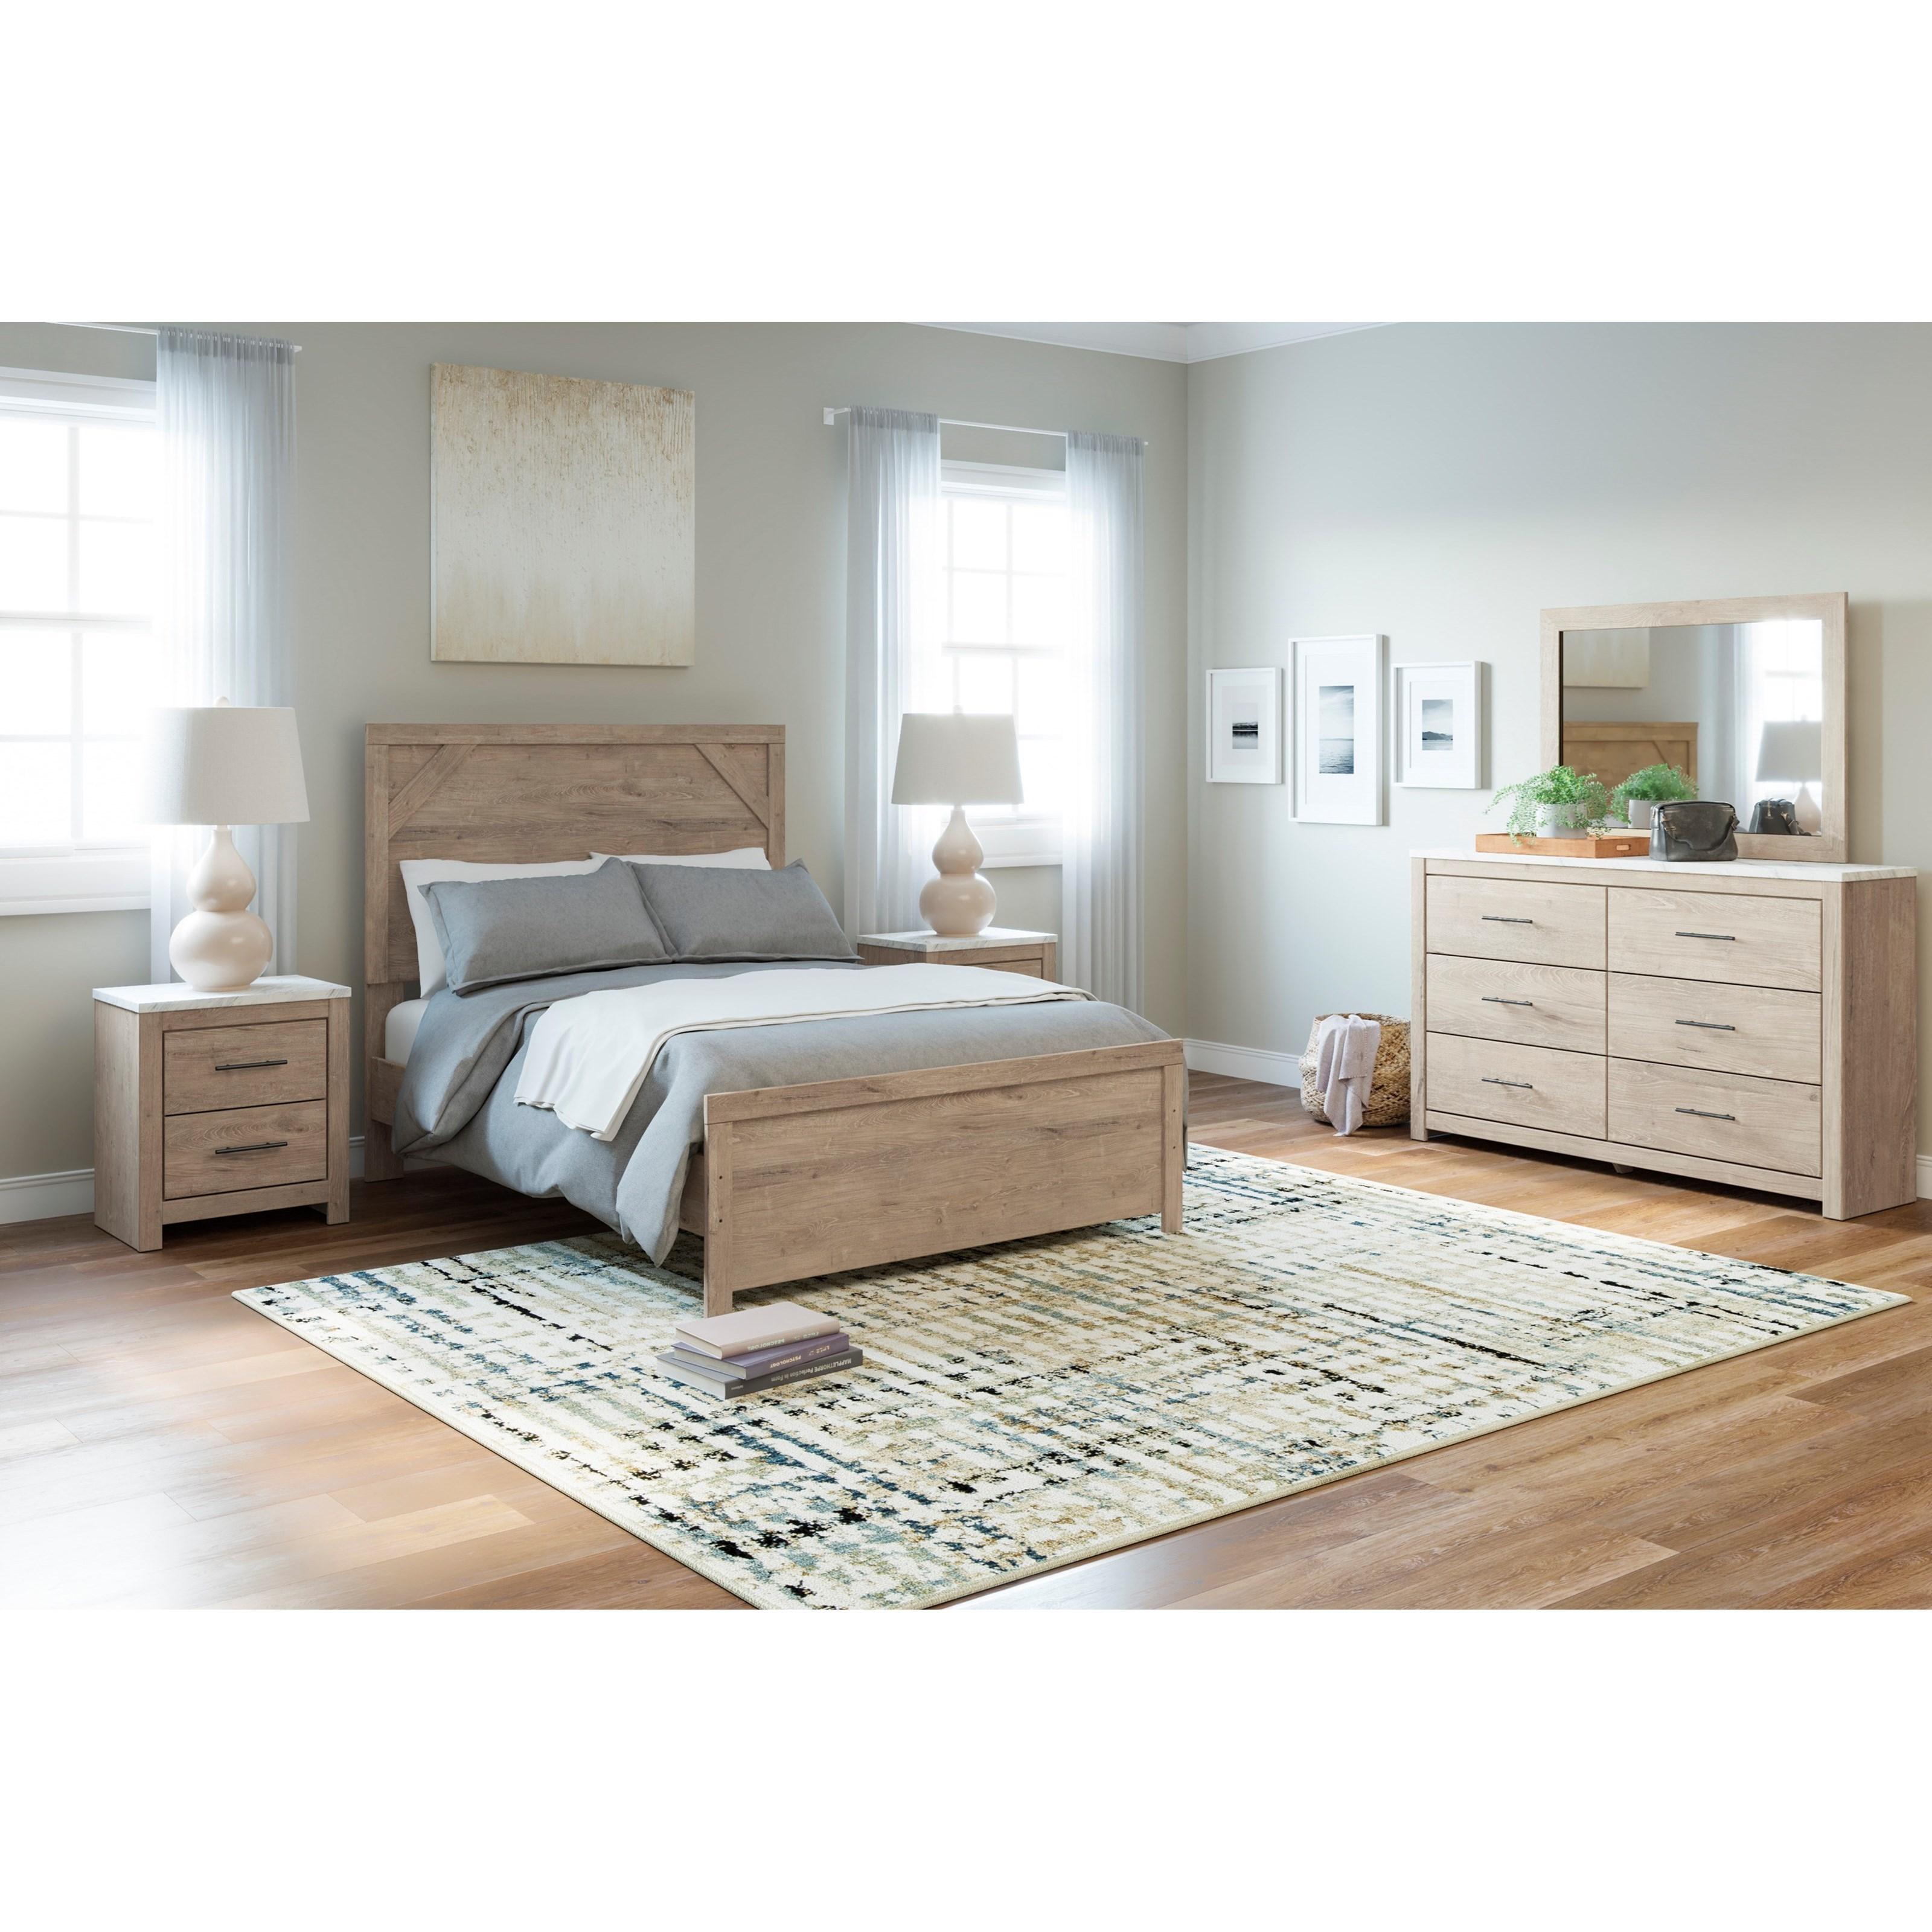 Senniberg Full Bedroom Group by Ashley (Signature Design) at Johnny Janosik